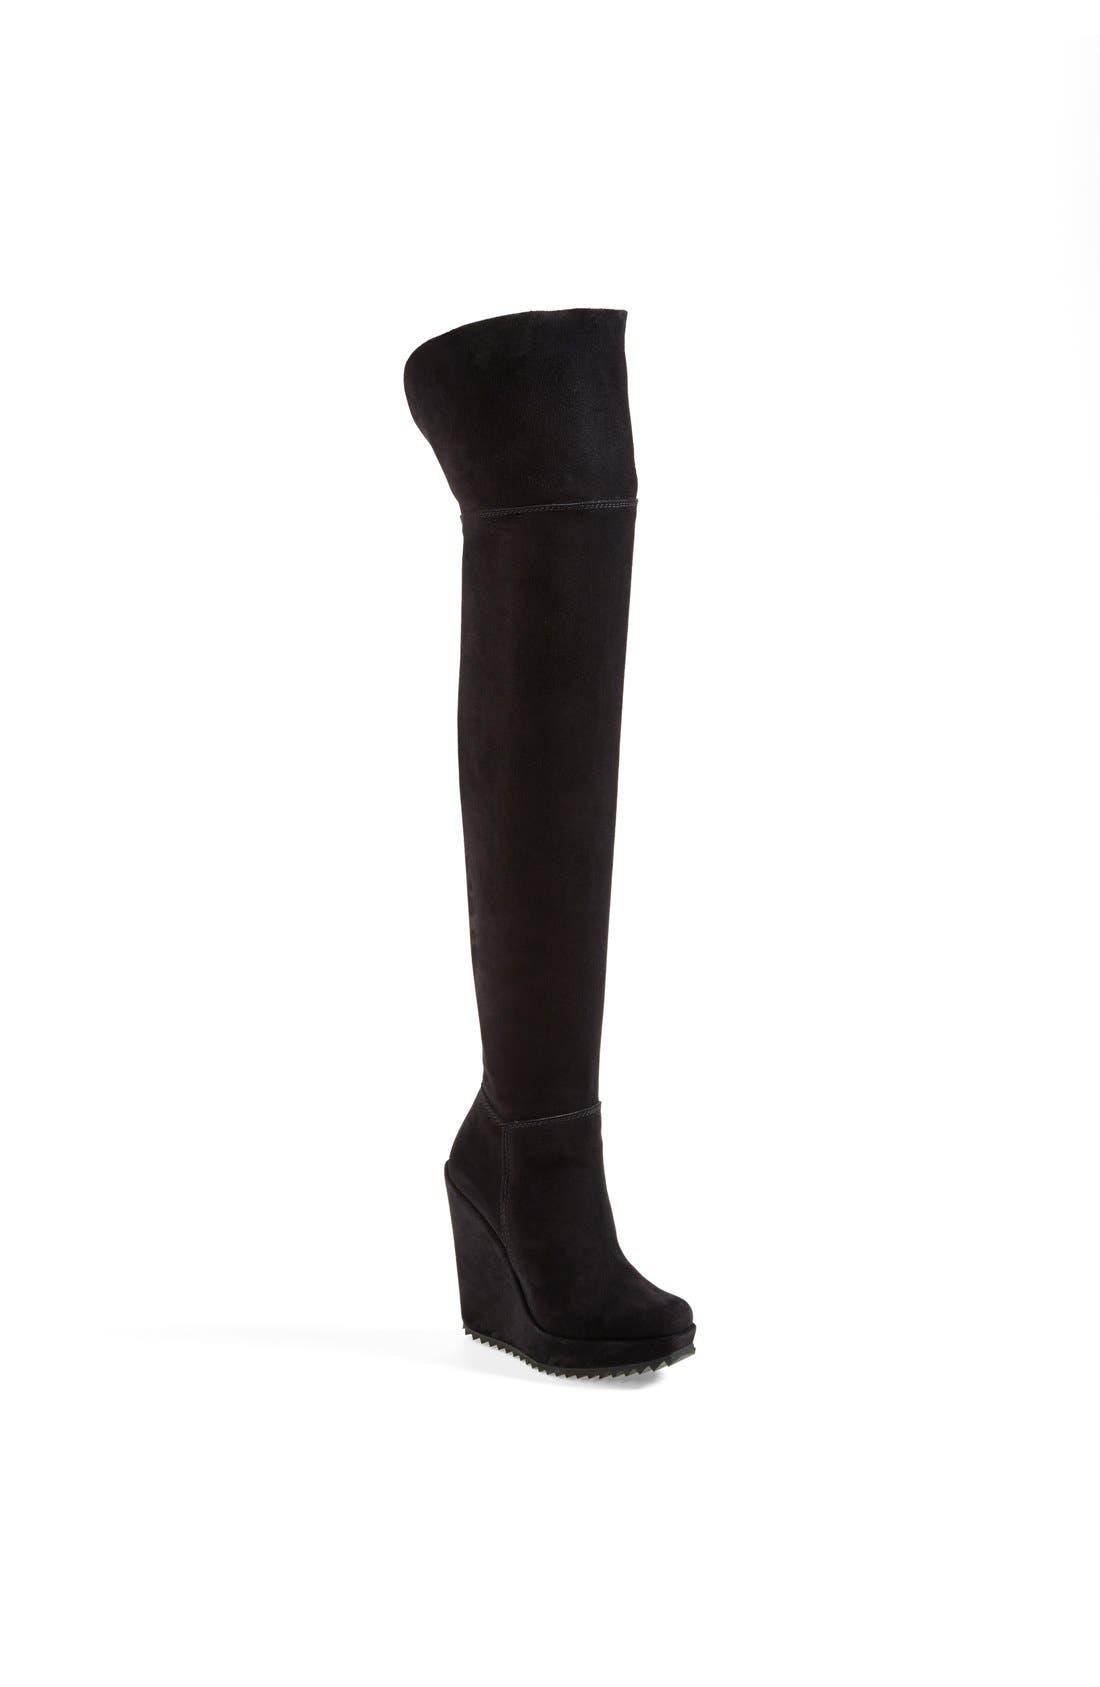 Alternate Image 1 Selected - Pedro Garcia 'Vanne' Over-the-Knee Boot (Women)